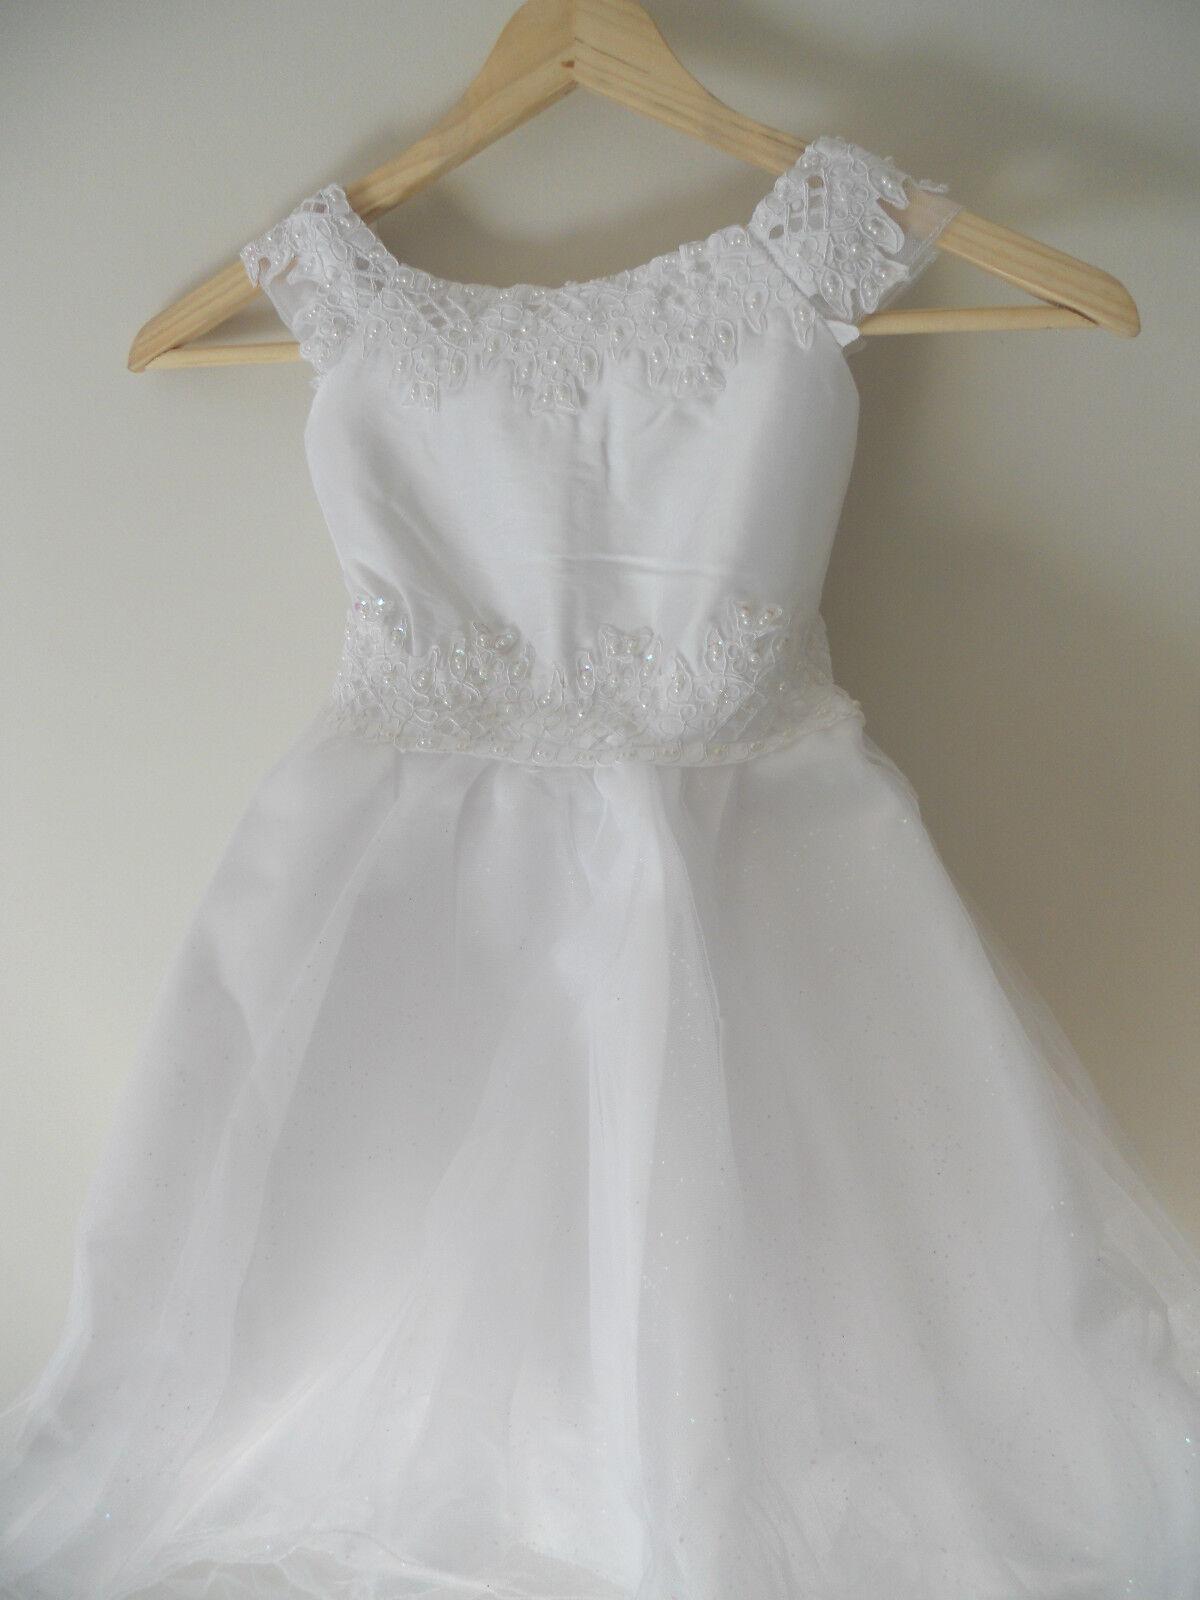 Flower Girl's Jeweled Beaded Sequin Dress Size 4 Bridal Tulle Princess Wedding